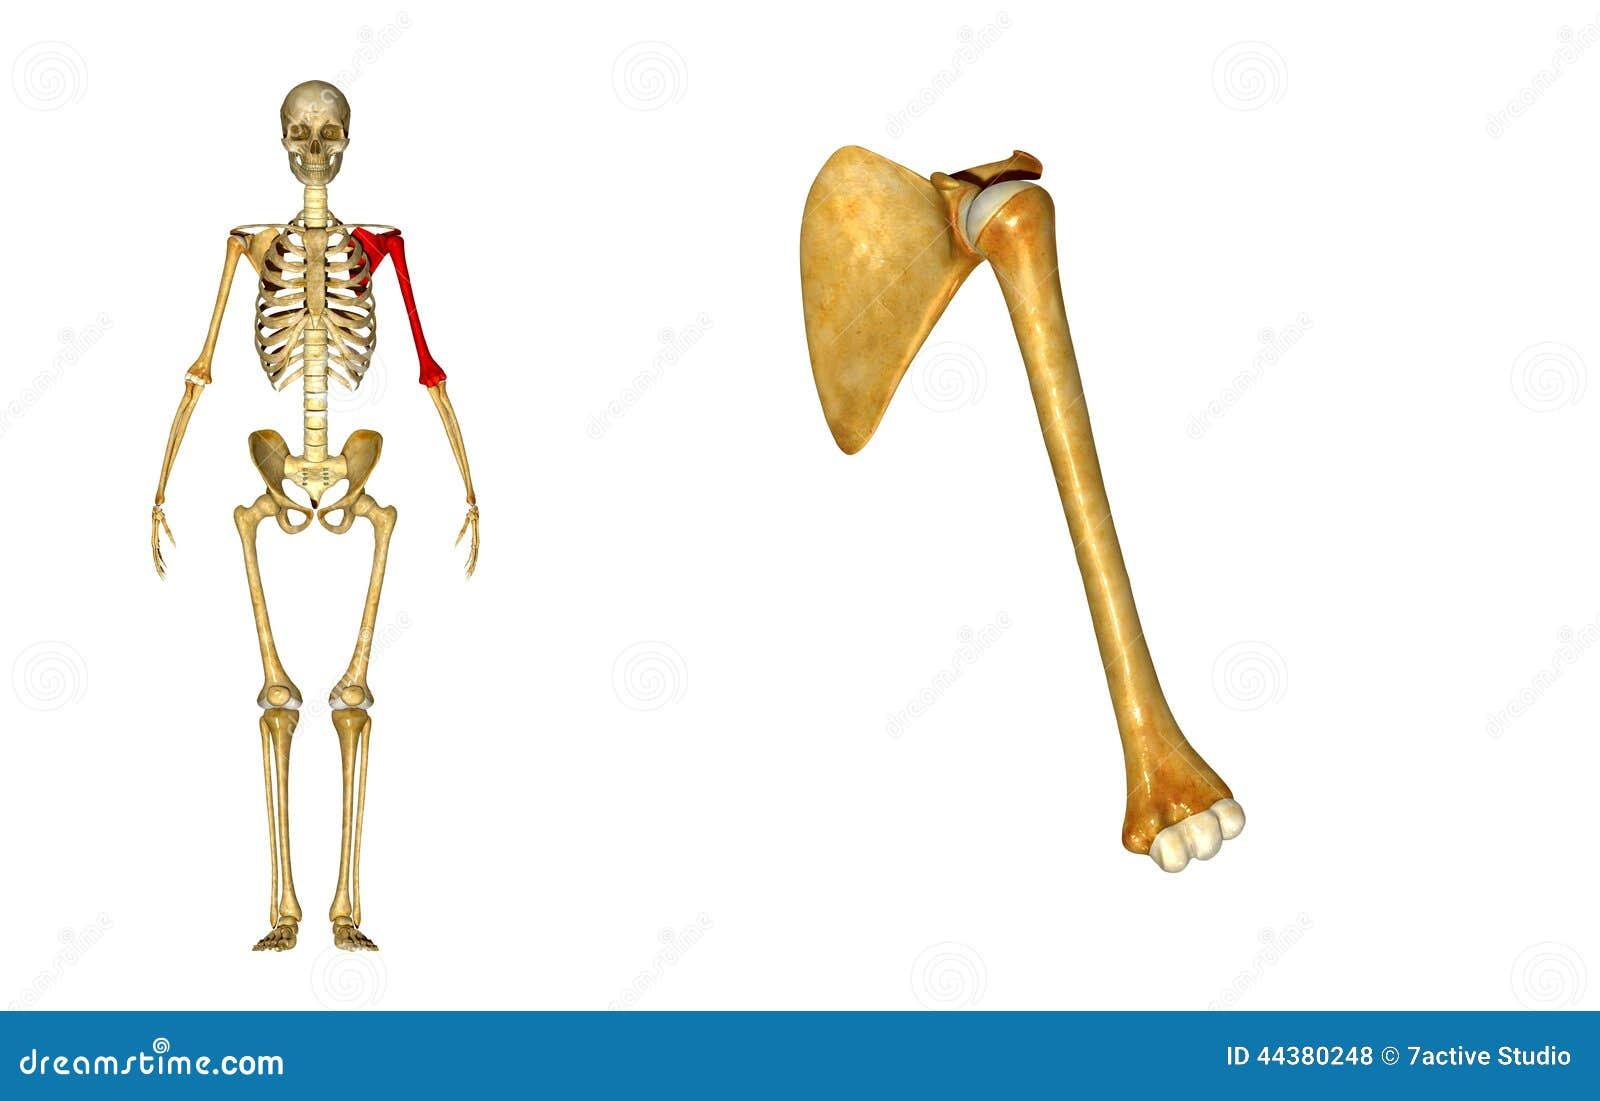 328129522825019530 also 08 also Pelvic Muscles Diagram moreover Human Skeleton Unlabeled Worksheet besides Humerus. on bone labeling exercises